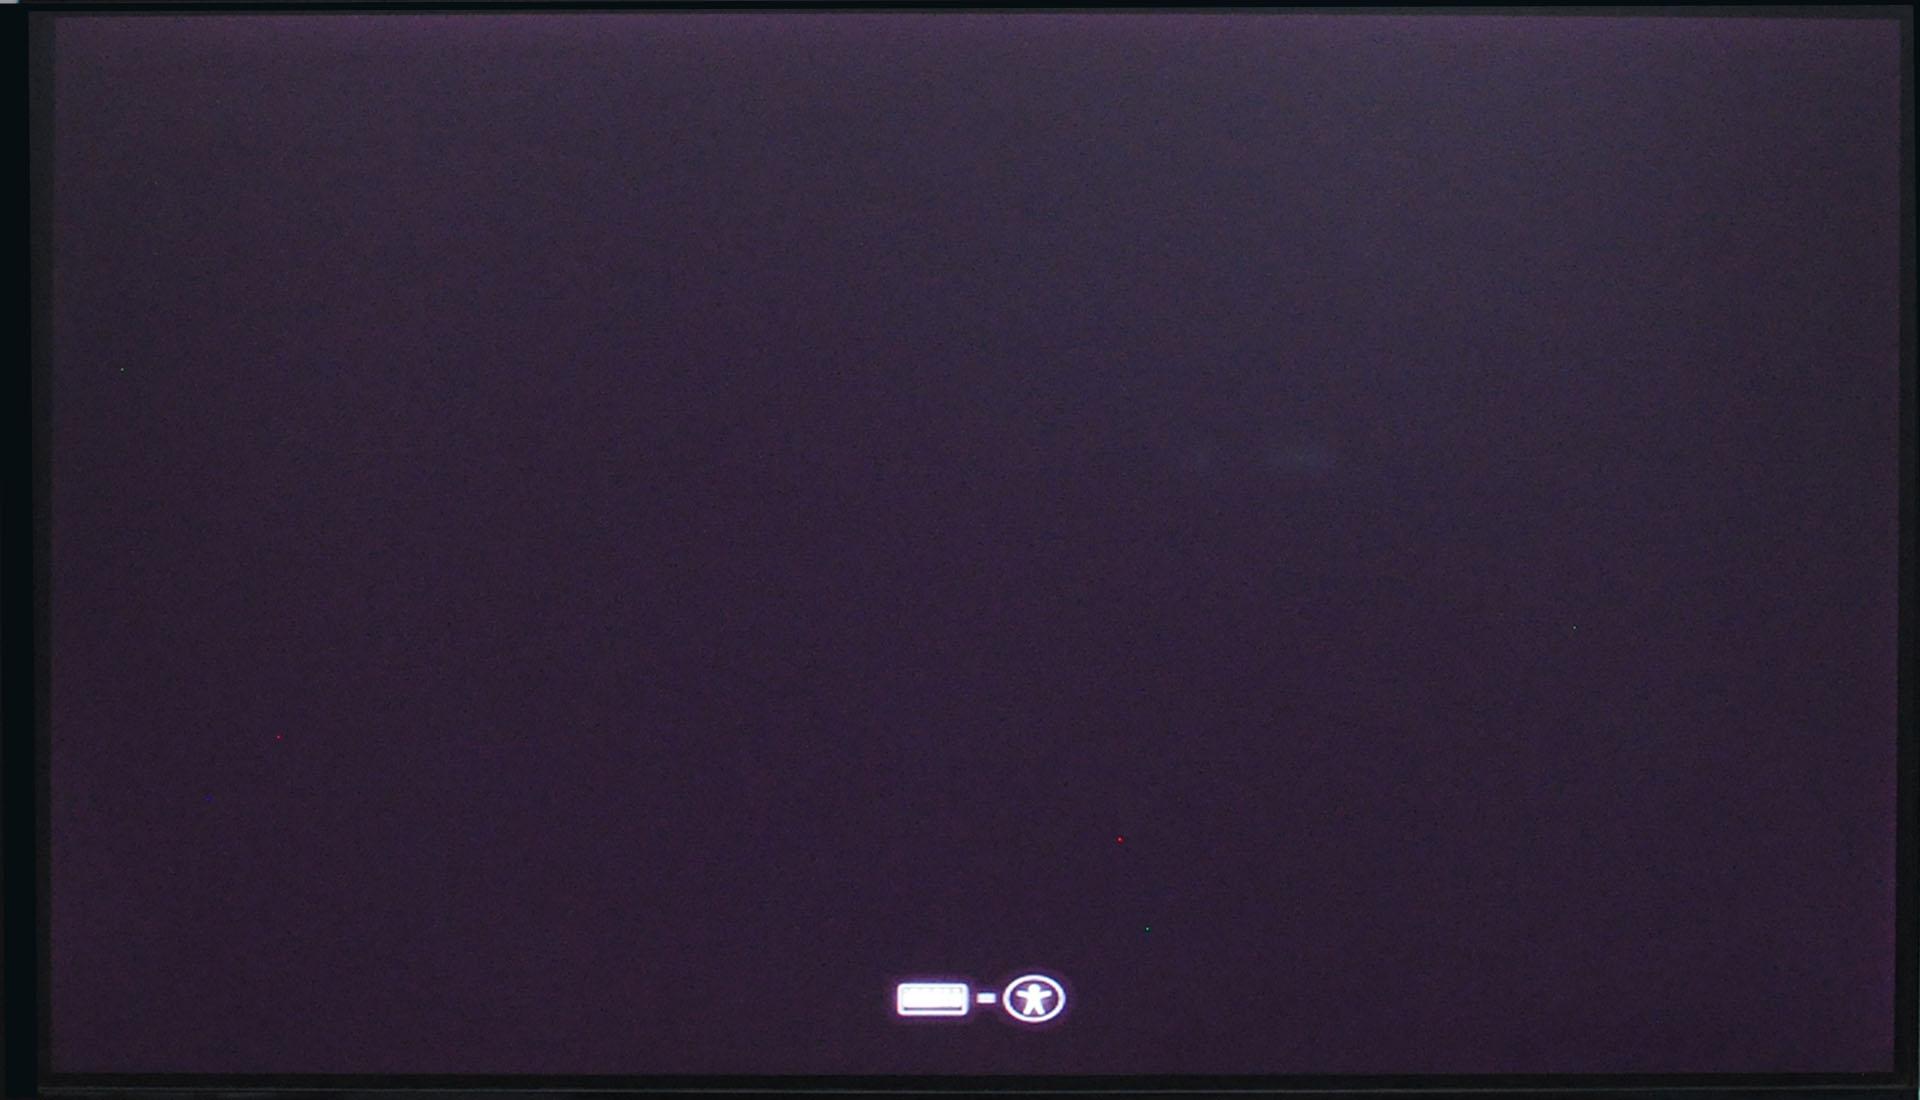 Install Ubuntu 20.04 LTS - Loader